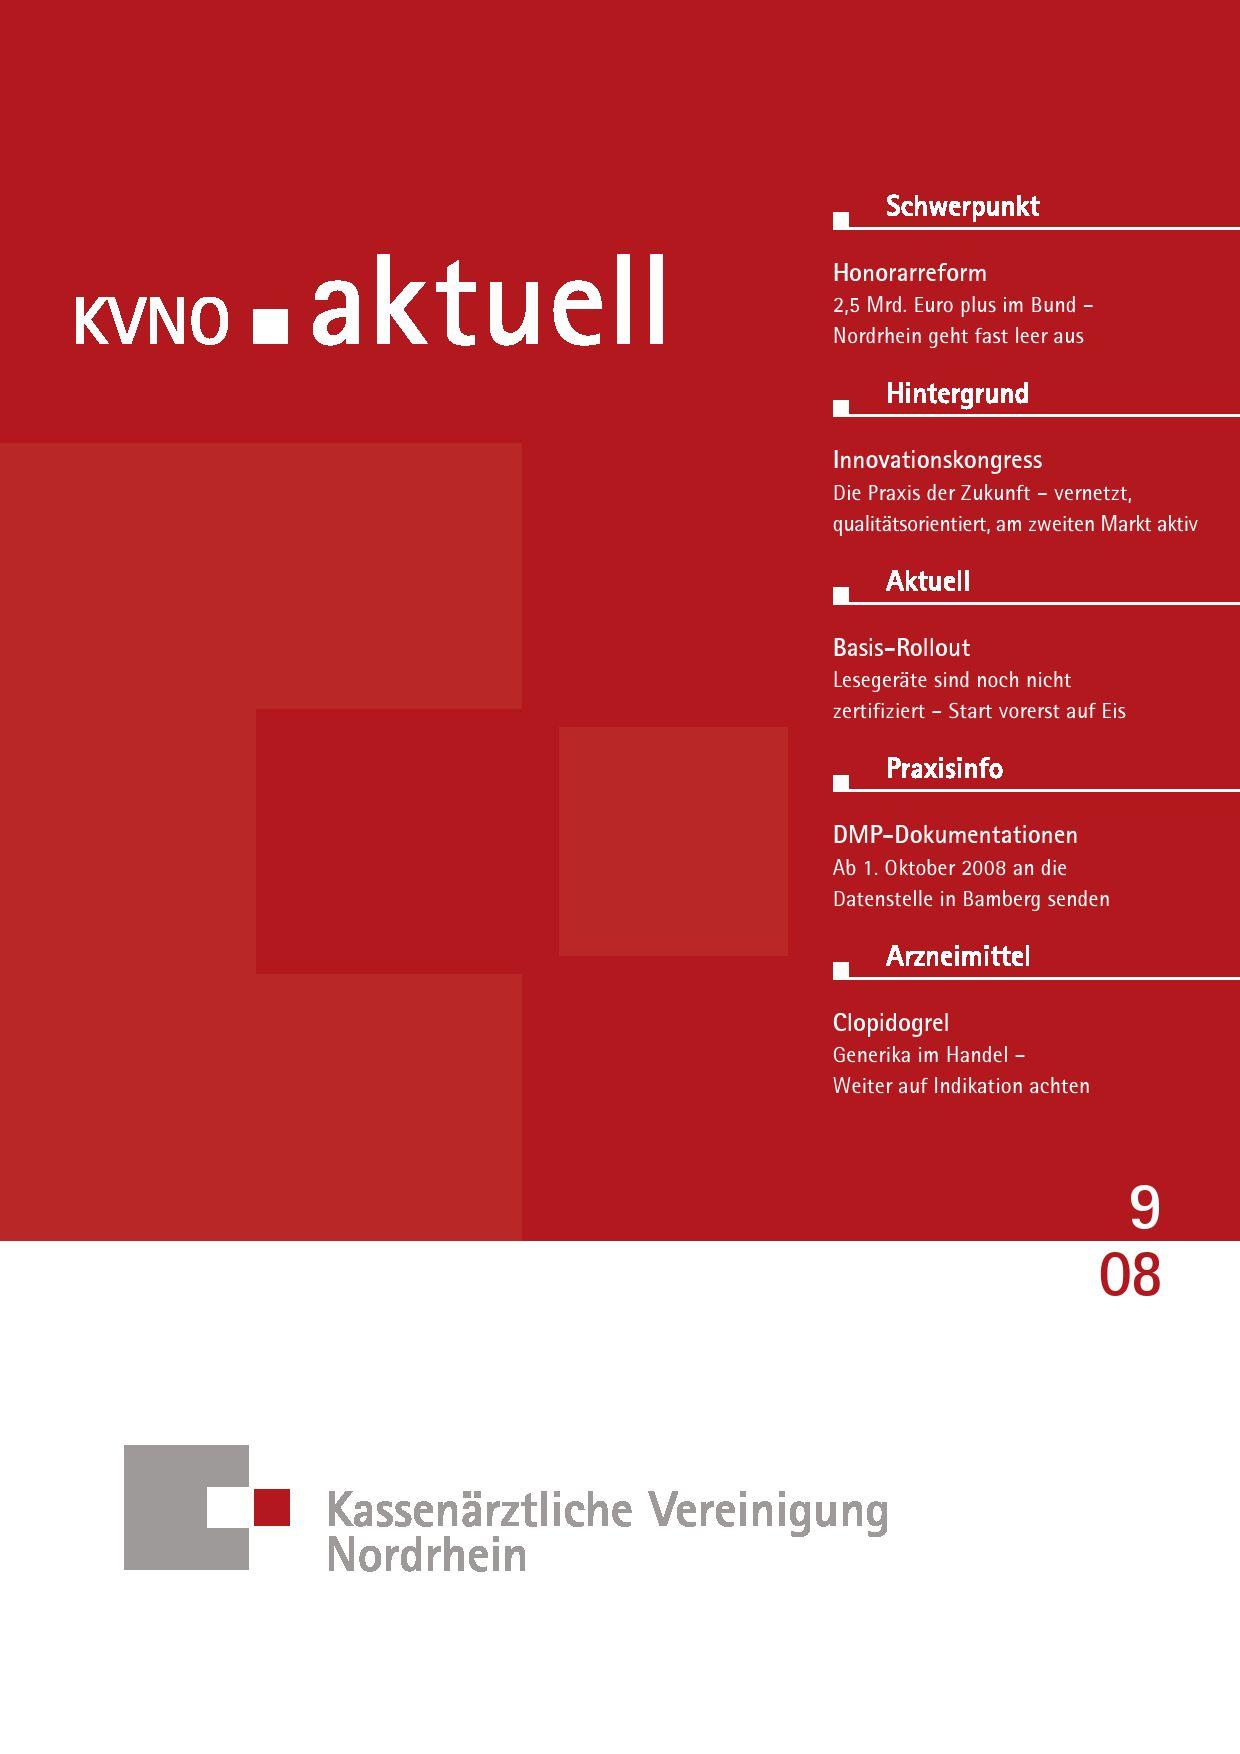 KVNO aktuell 9 2008 by KV Nordrhein - issuu